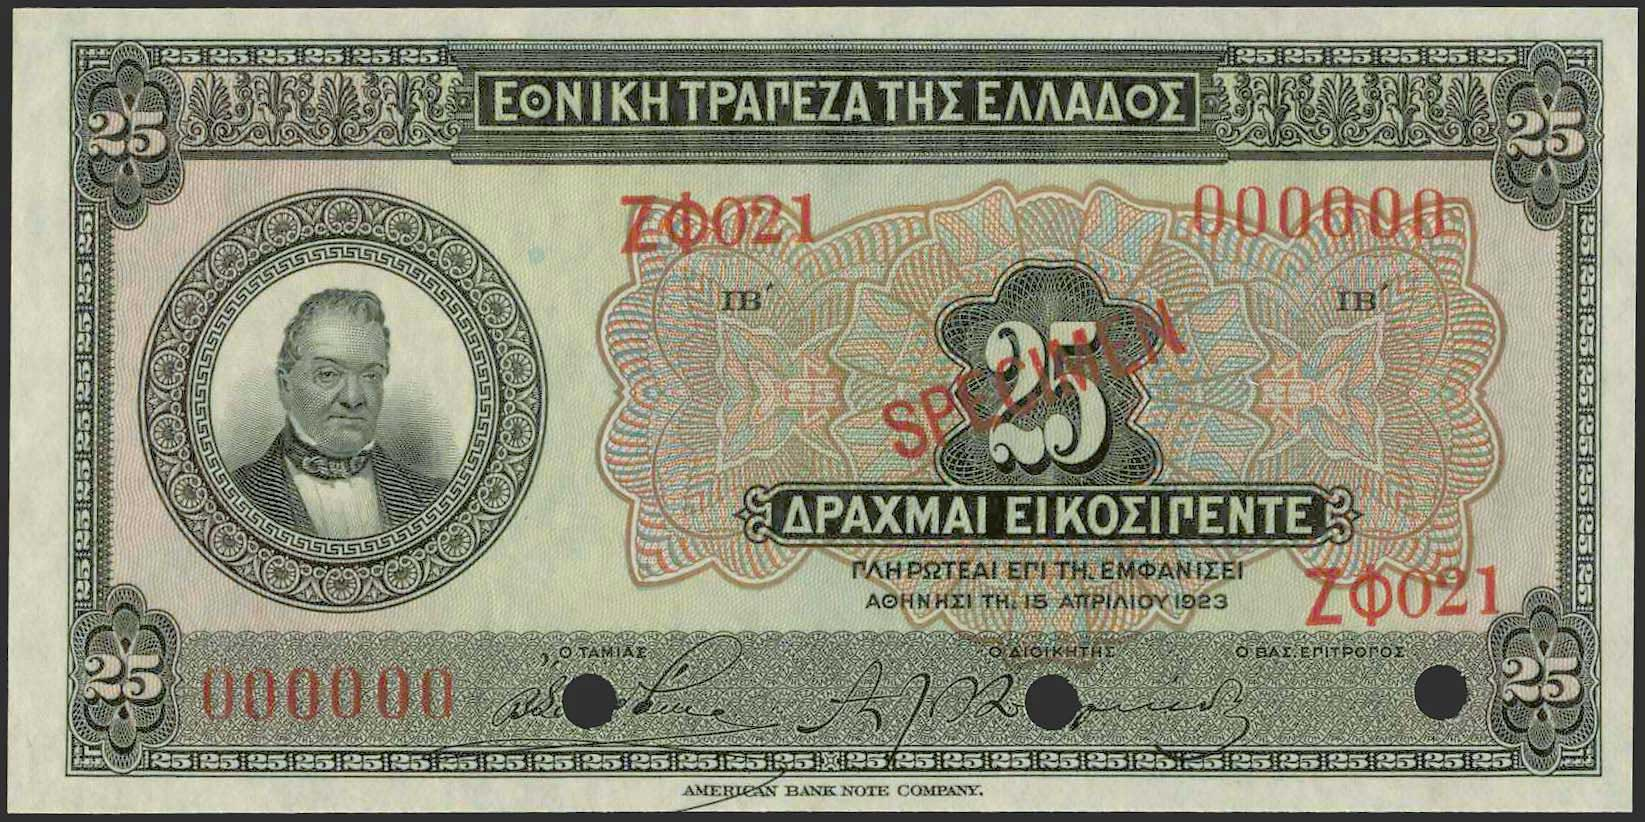 Lot 9274 - GREECE-  PAPER MONEY - BANKNOTES National Bank of Greece -  A. Karamitsos Public & LIVE Bid Auction 610 Coins, Medals & Banknotes